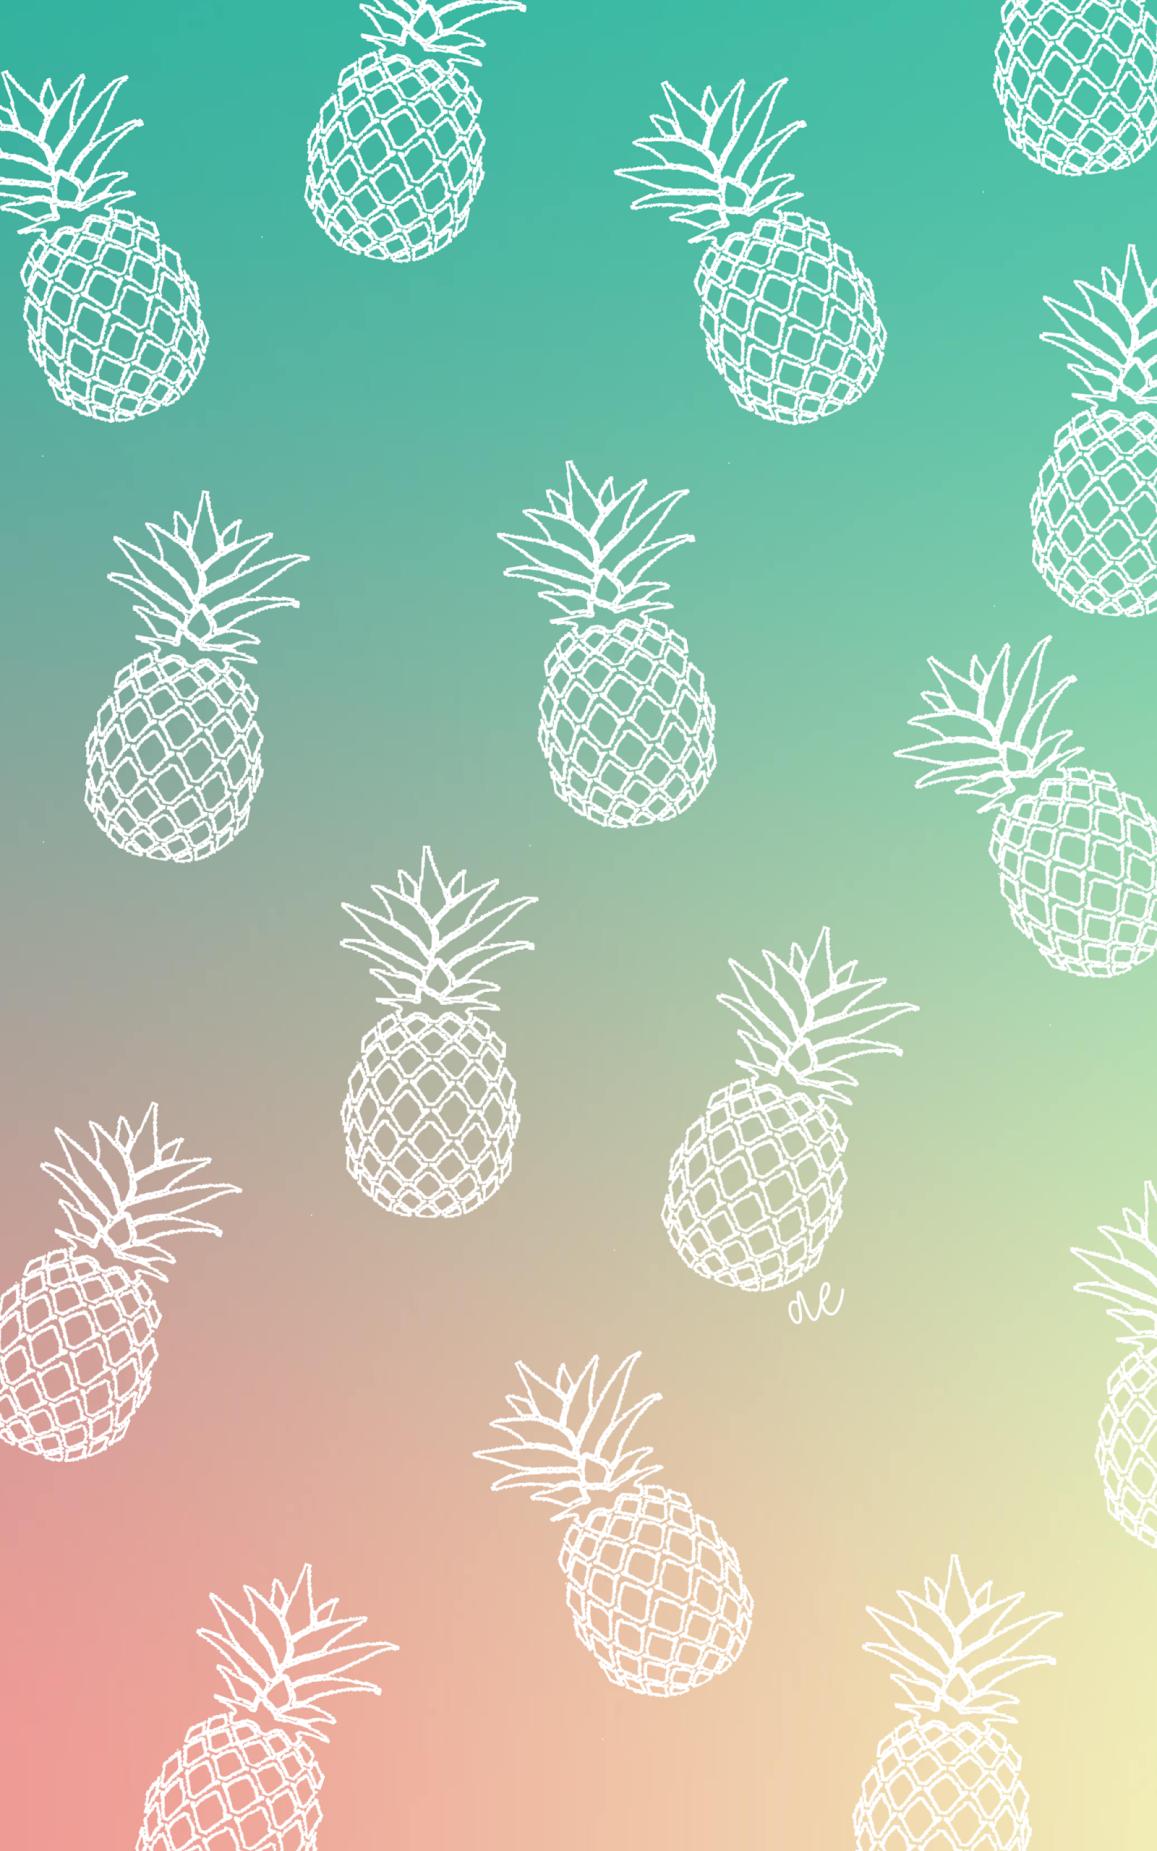 Pineapple Wallpaper Pineapple Wallpaper Cute Pineapple Wallpaper Tree Wallpaper Iphone